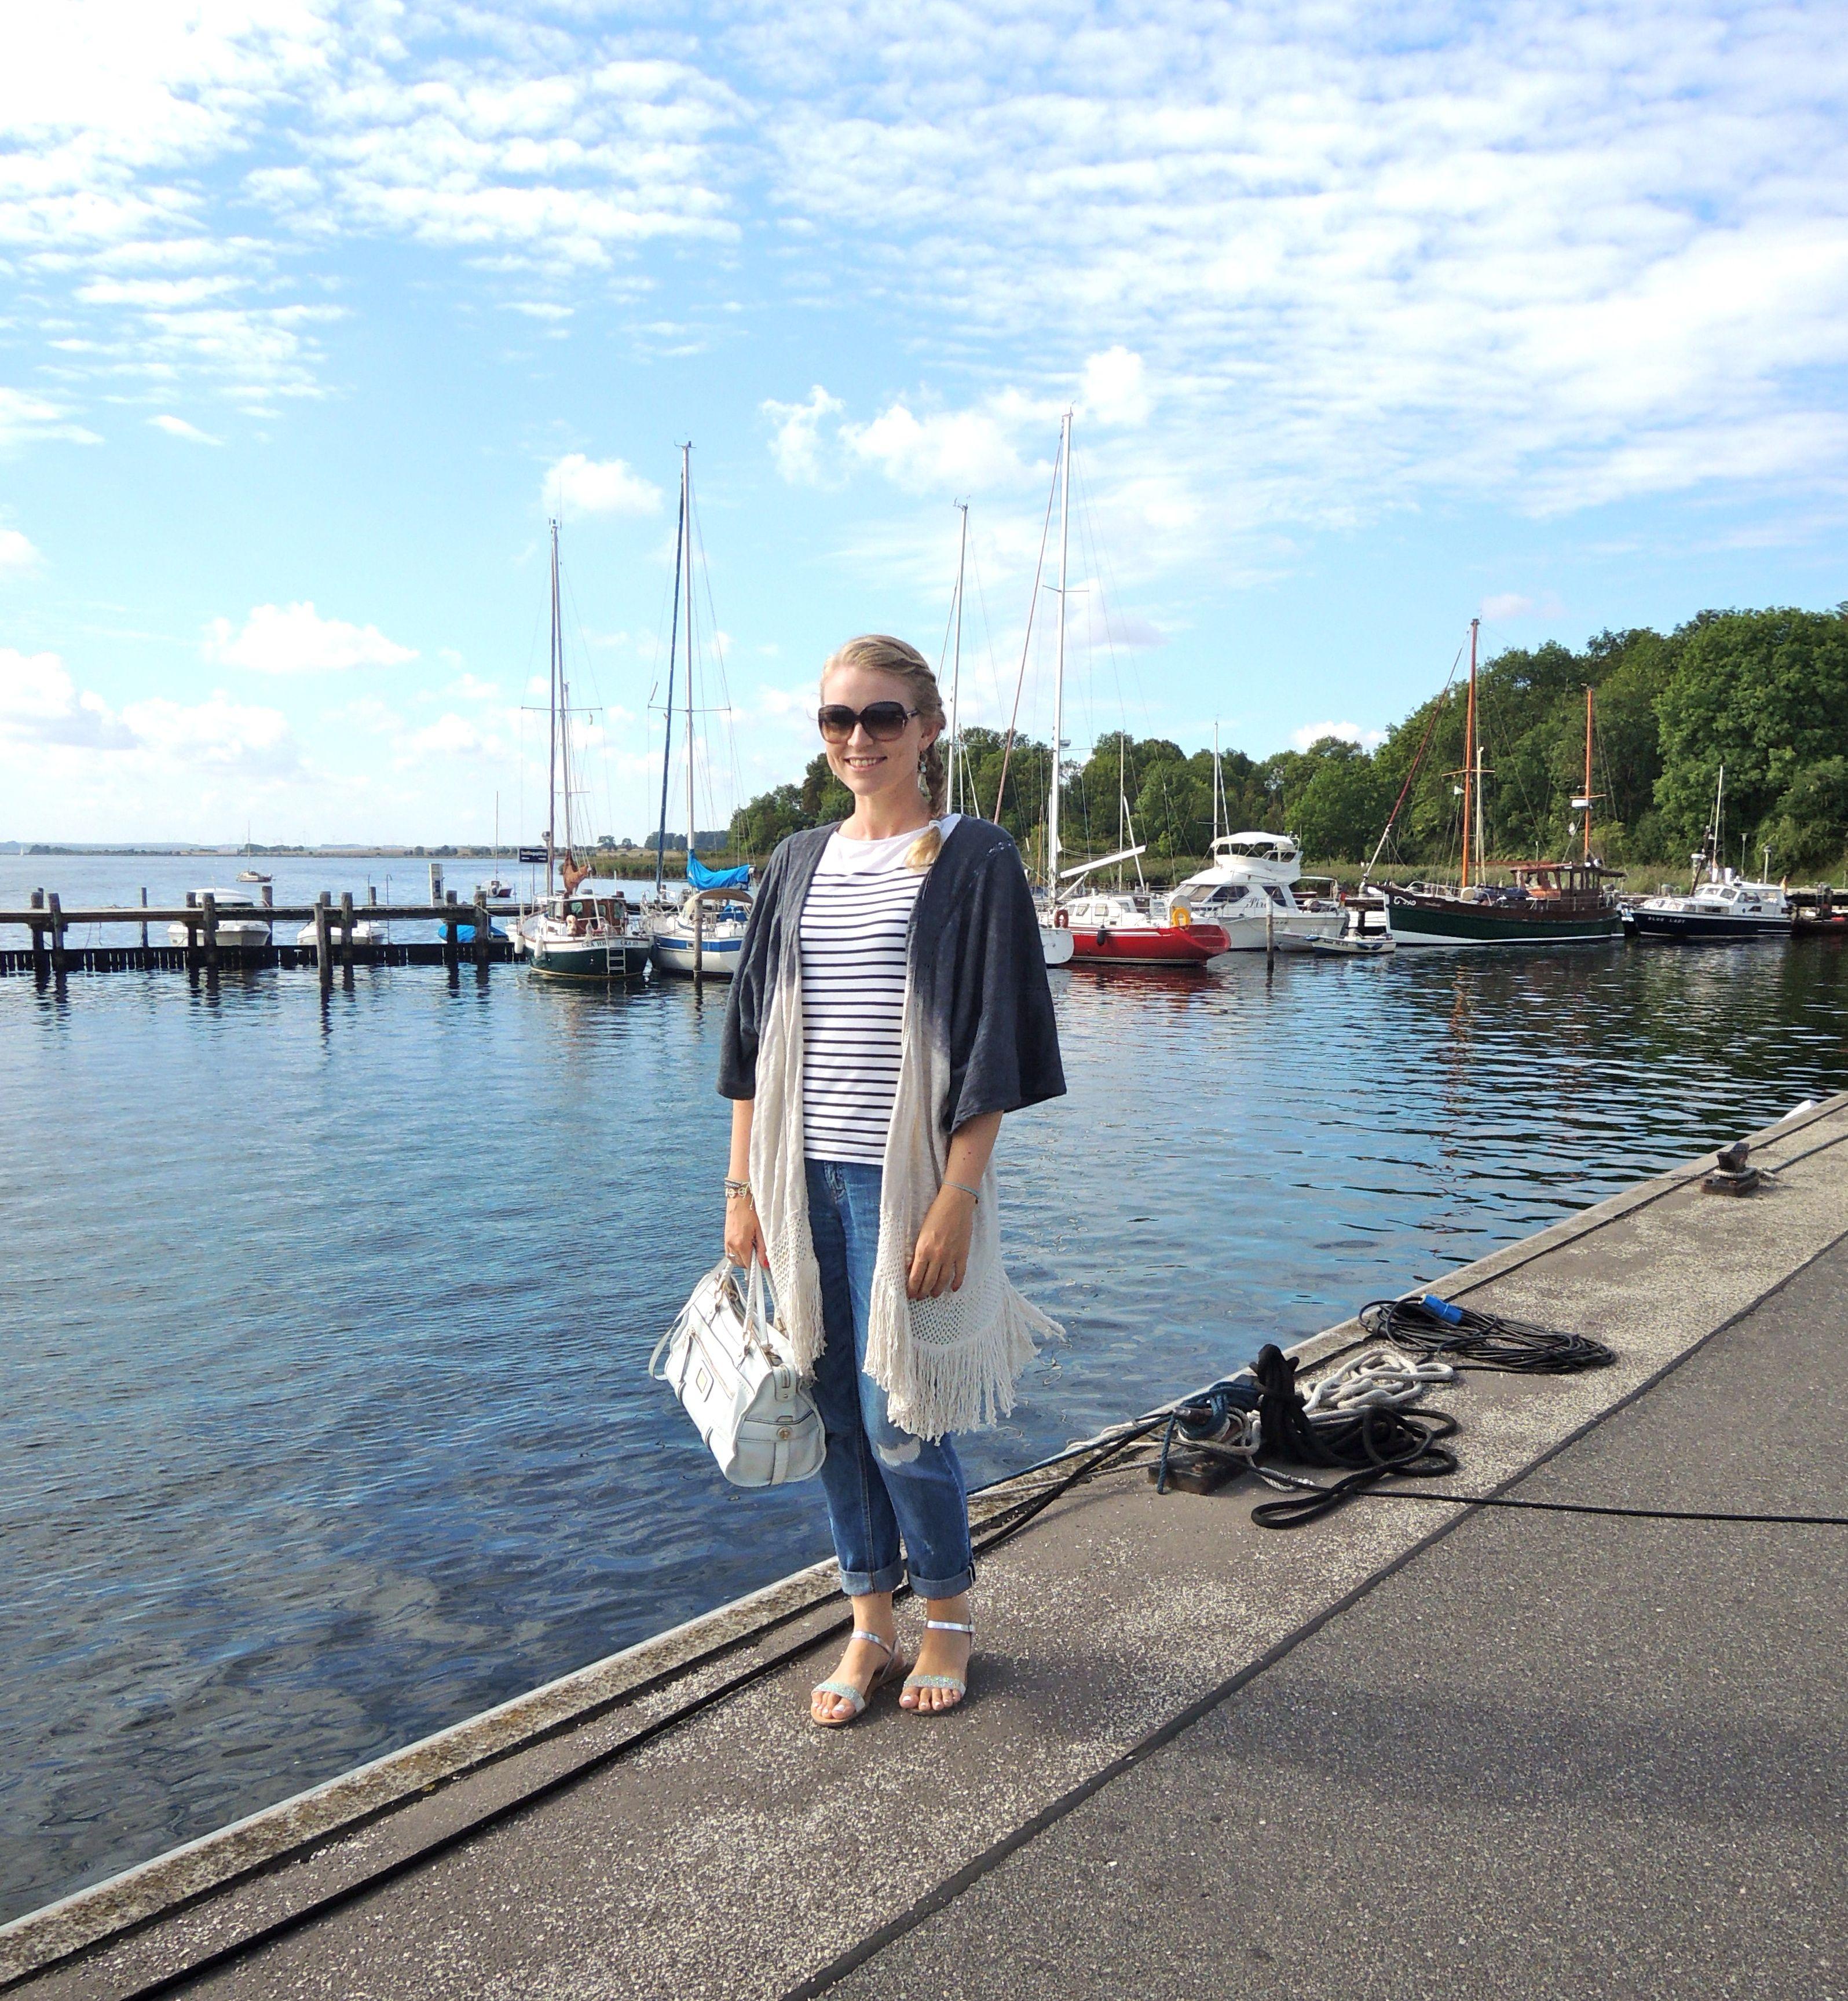 Shirt: H&M Cardigan: Zara Jeans: Cambio Bag: Guess Shoes: Esprit Sunnies: Gucci